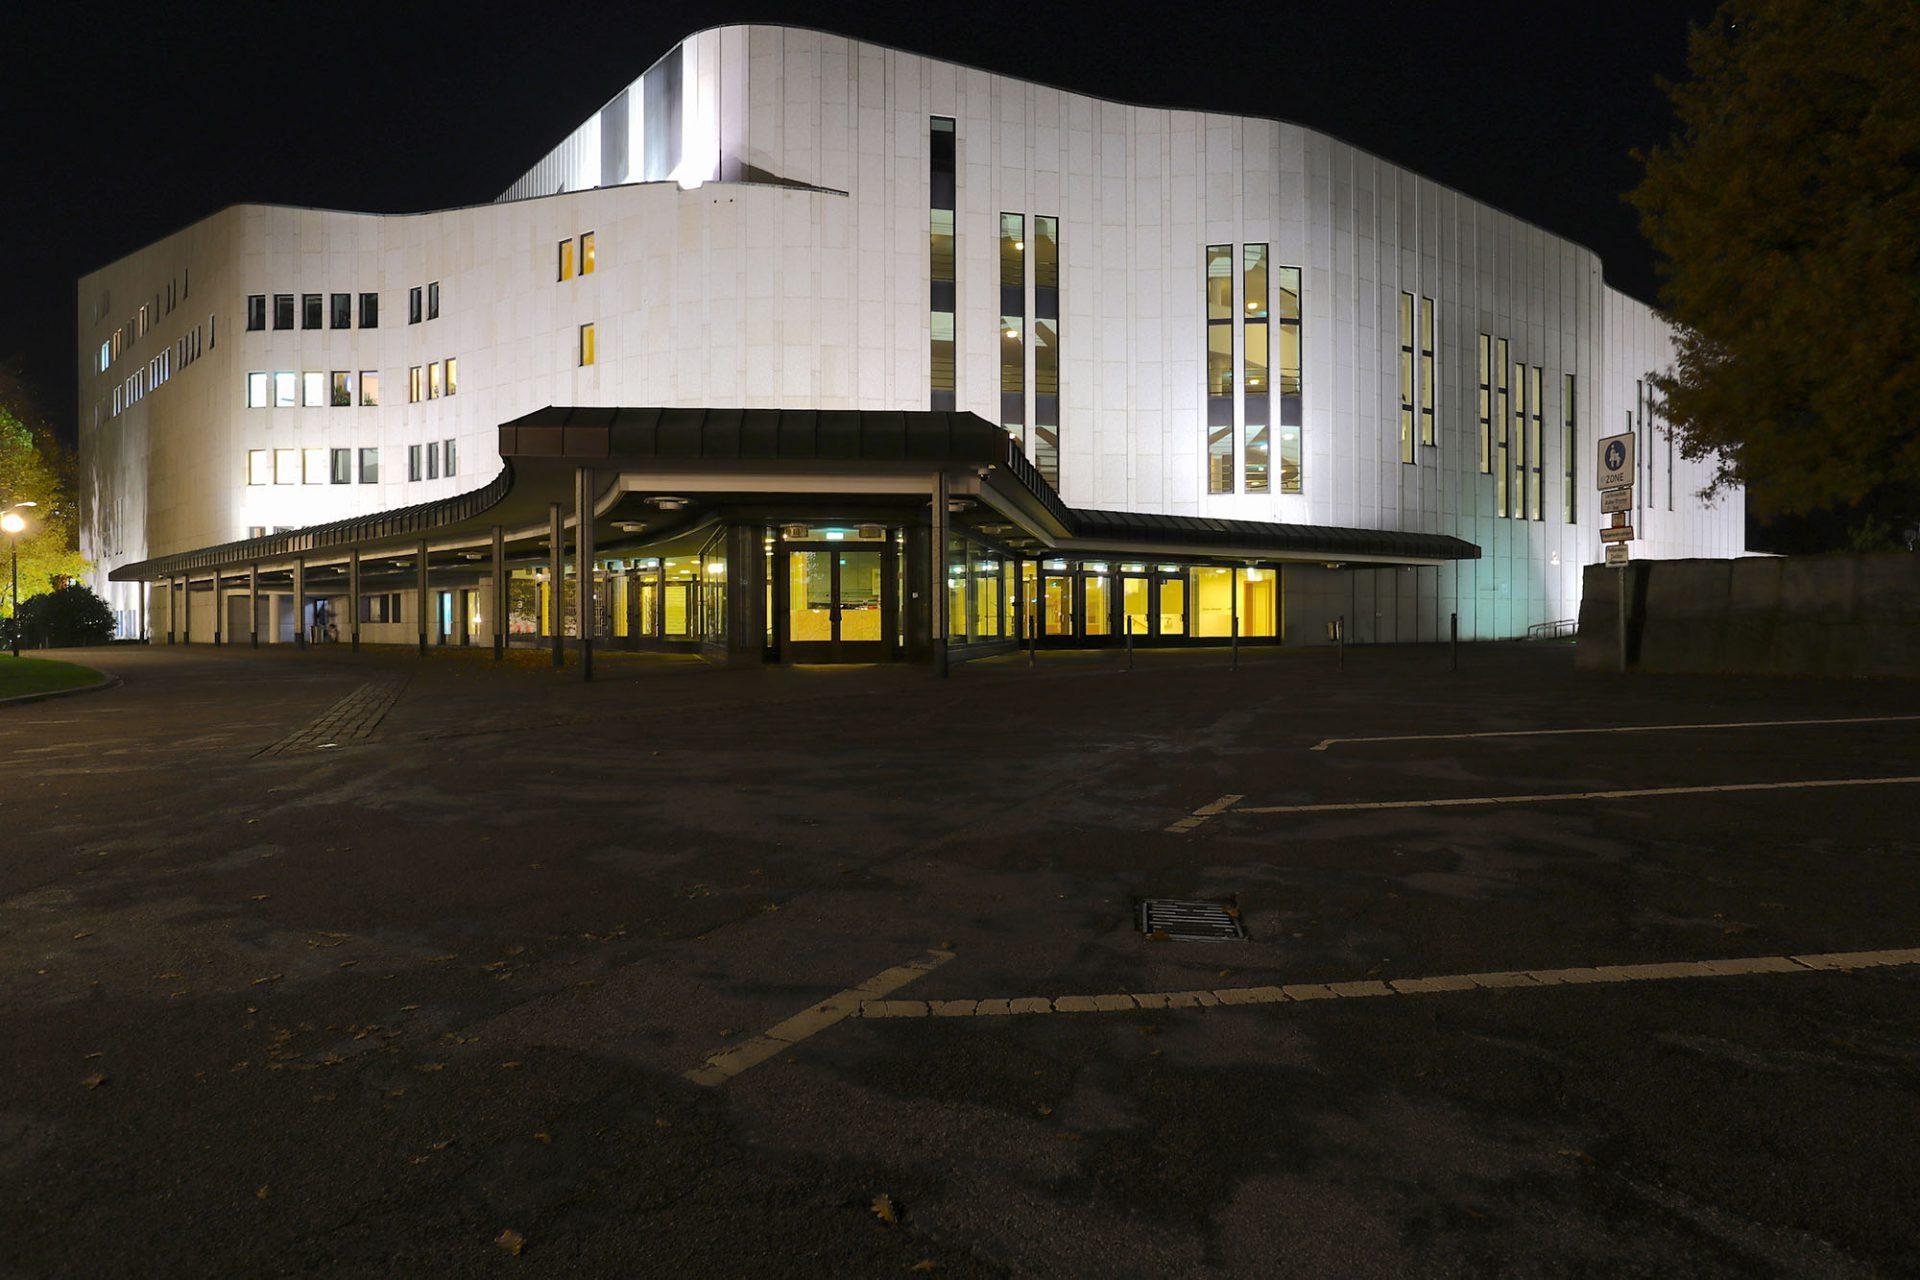 Aalto Musiktheater. Entwurf: Alvar Aalto mit Harald Deilmann (Umsetzung). Fertigstellung: 1988.